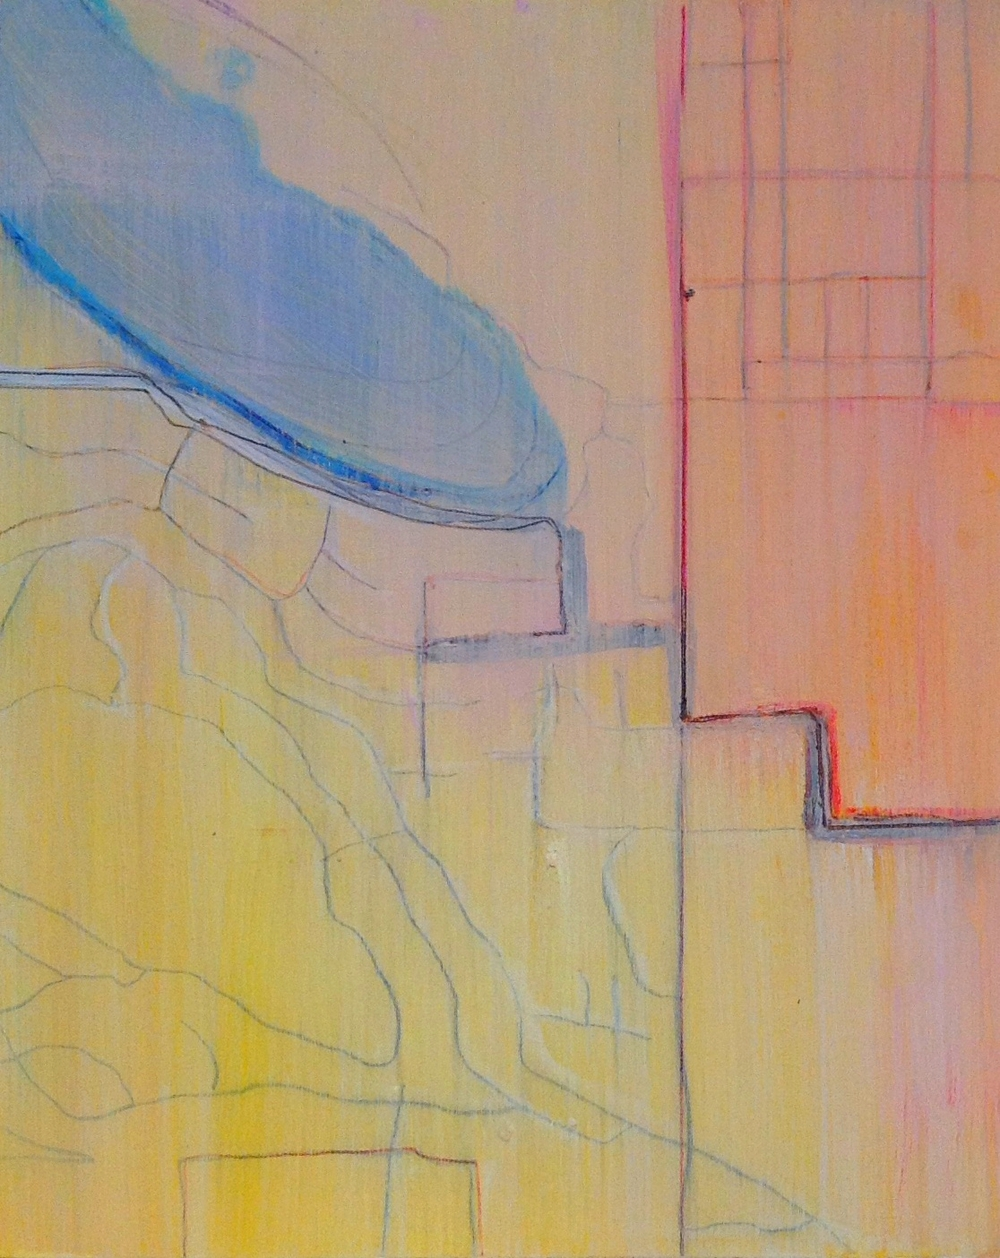 Artmap Section #5